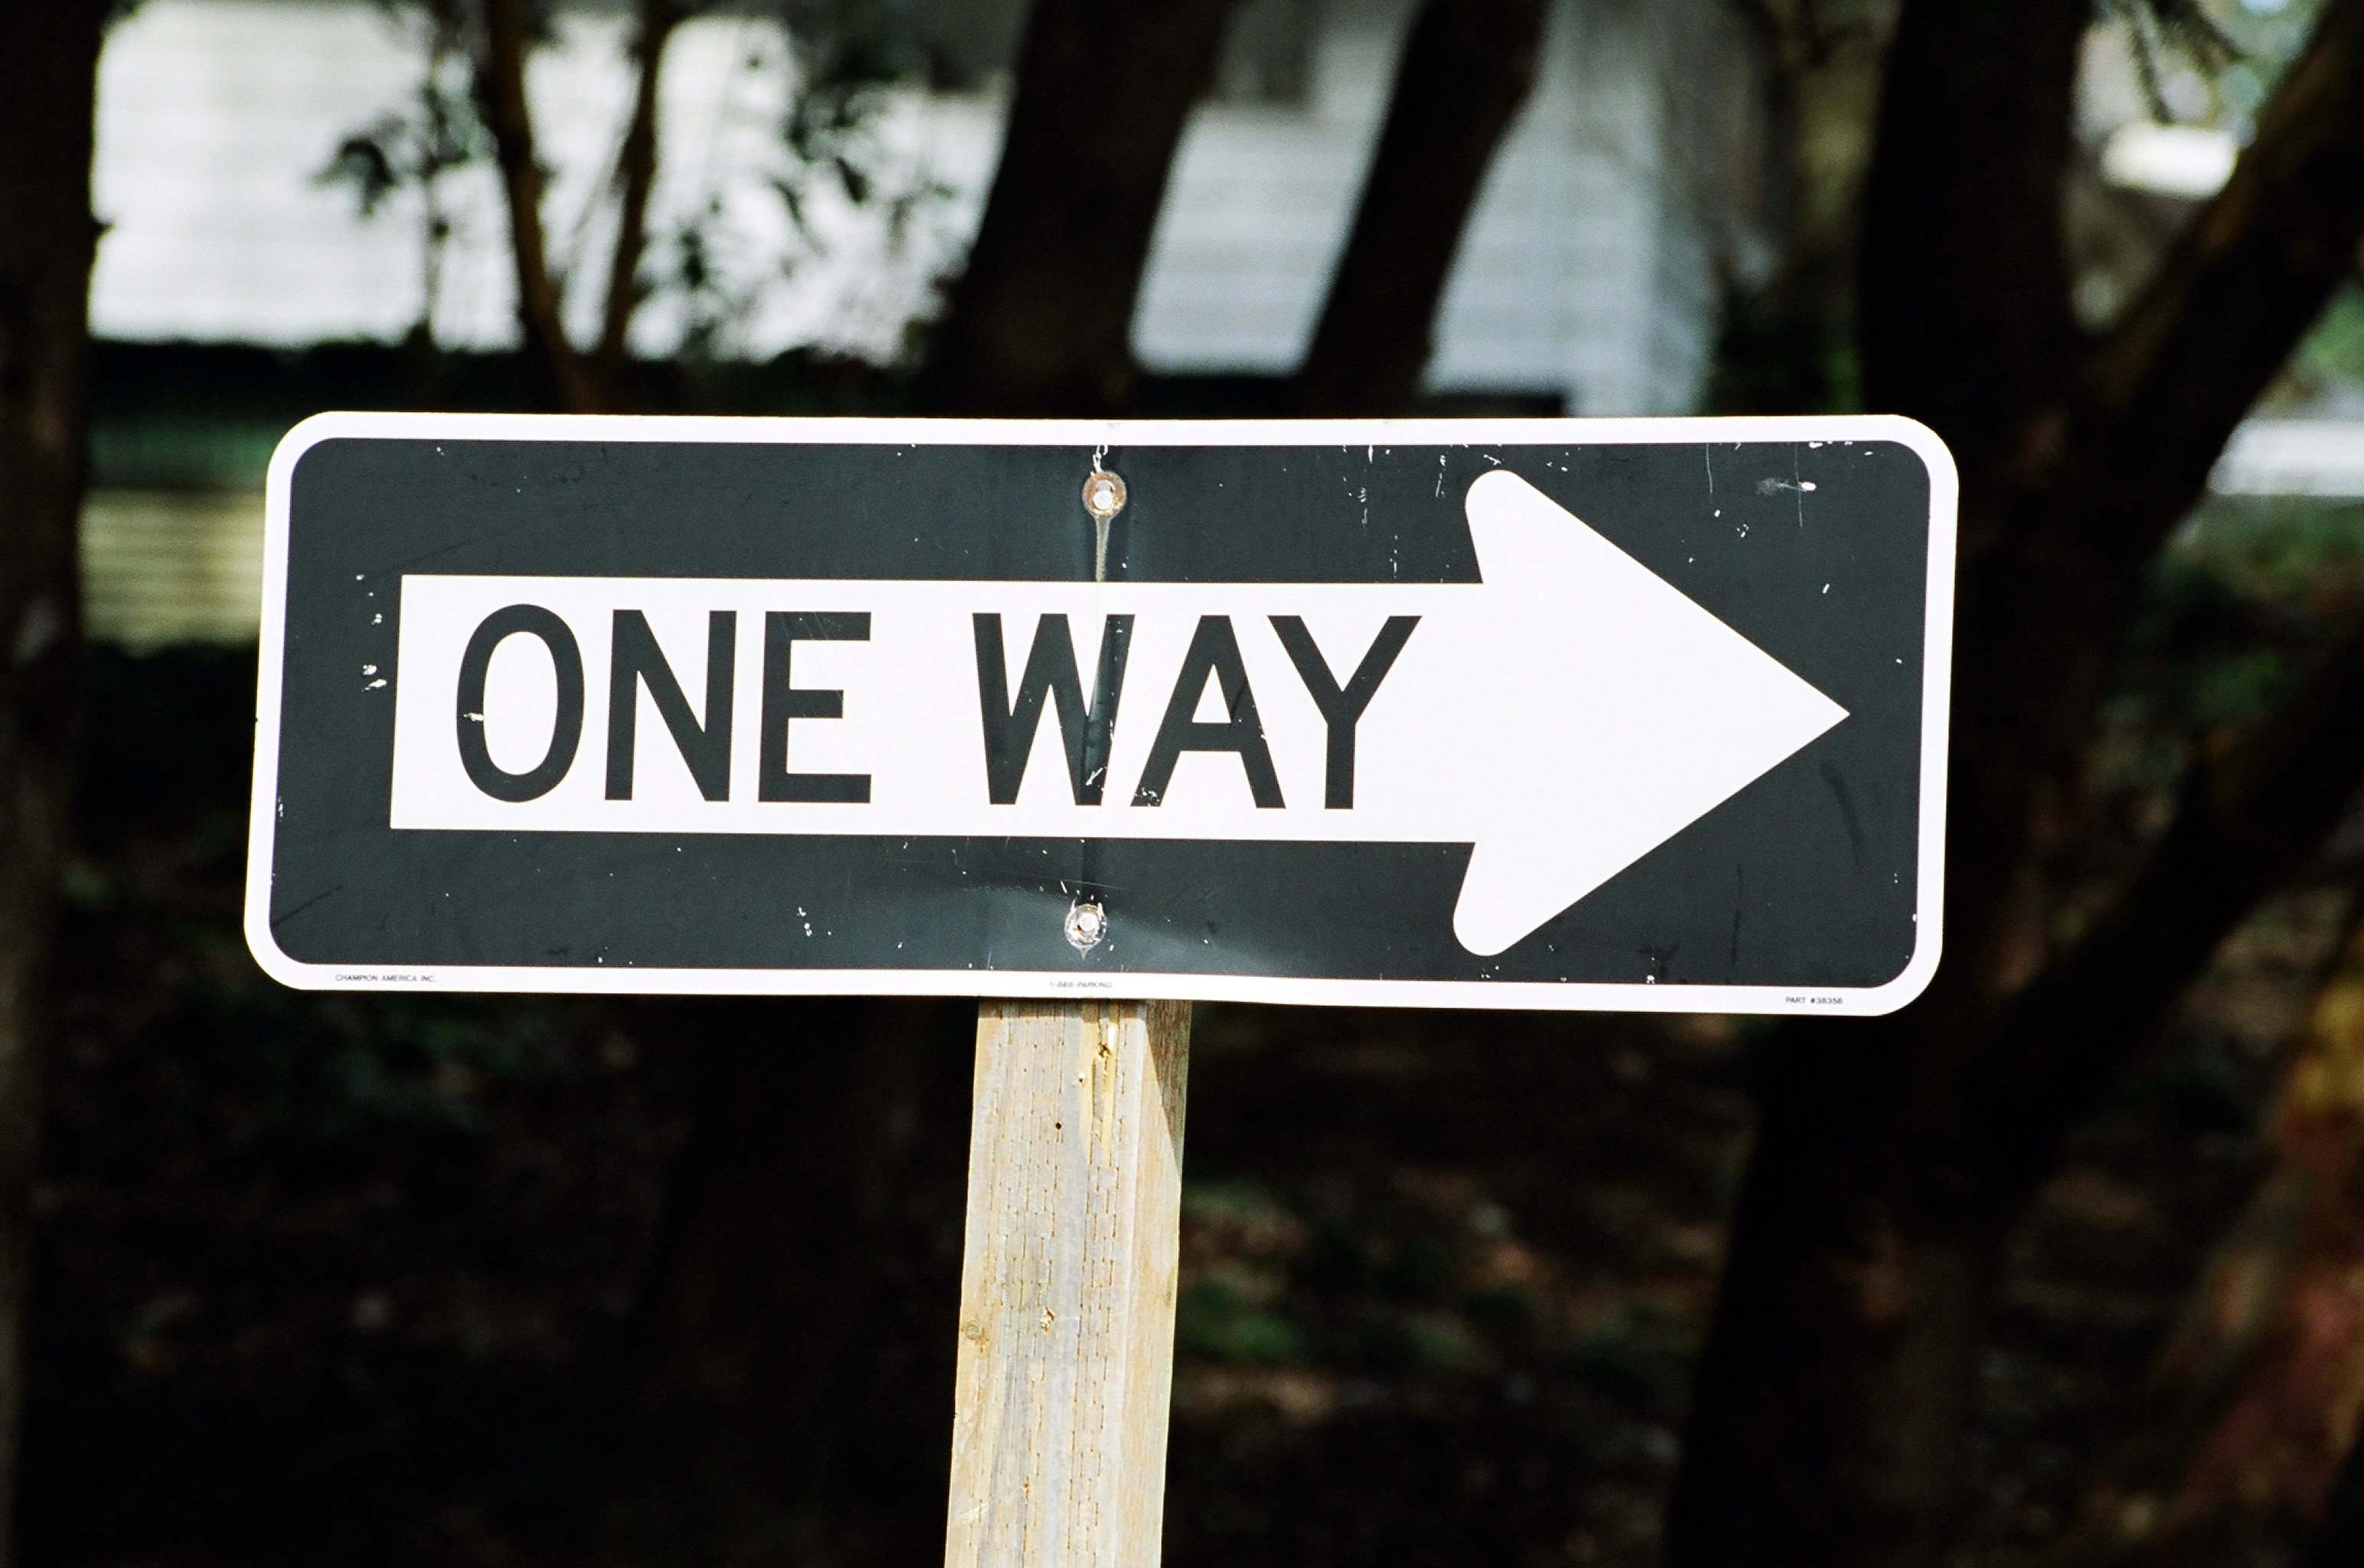 One way photo